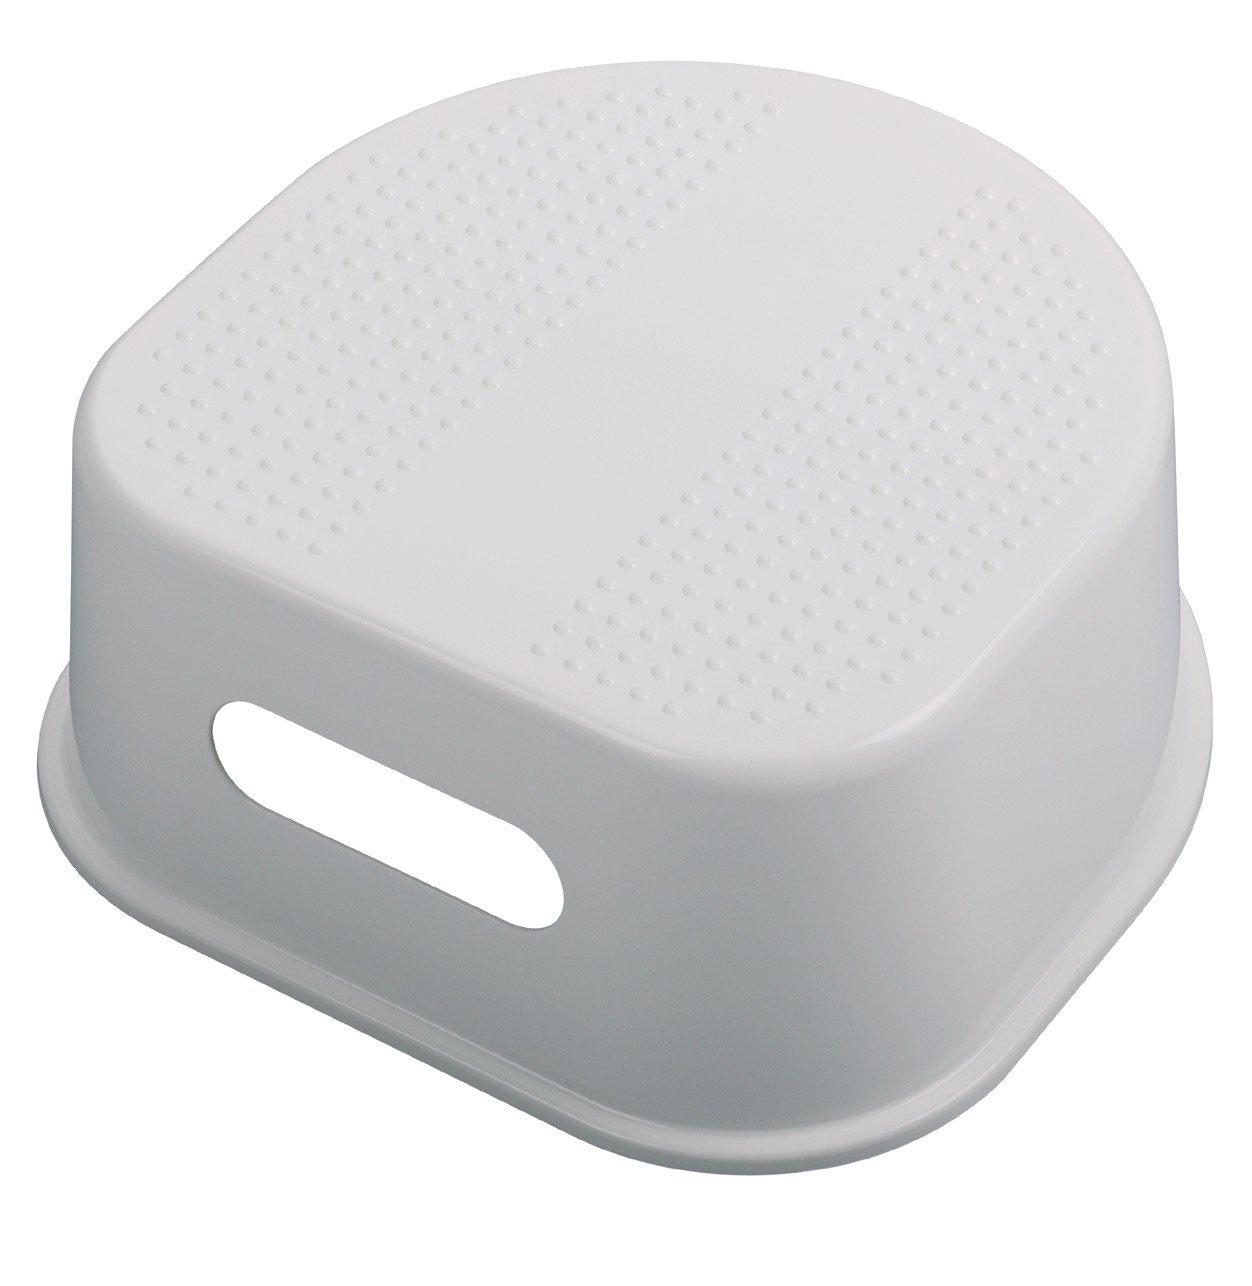 White Rotho Babydesign Tabouret 200240001 Surface et Pieds Antid/érapants Bella Bambina Blanc